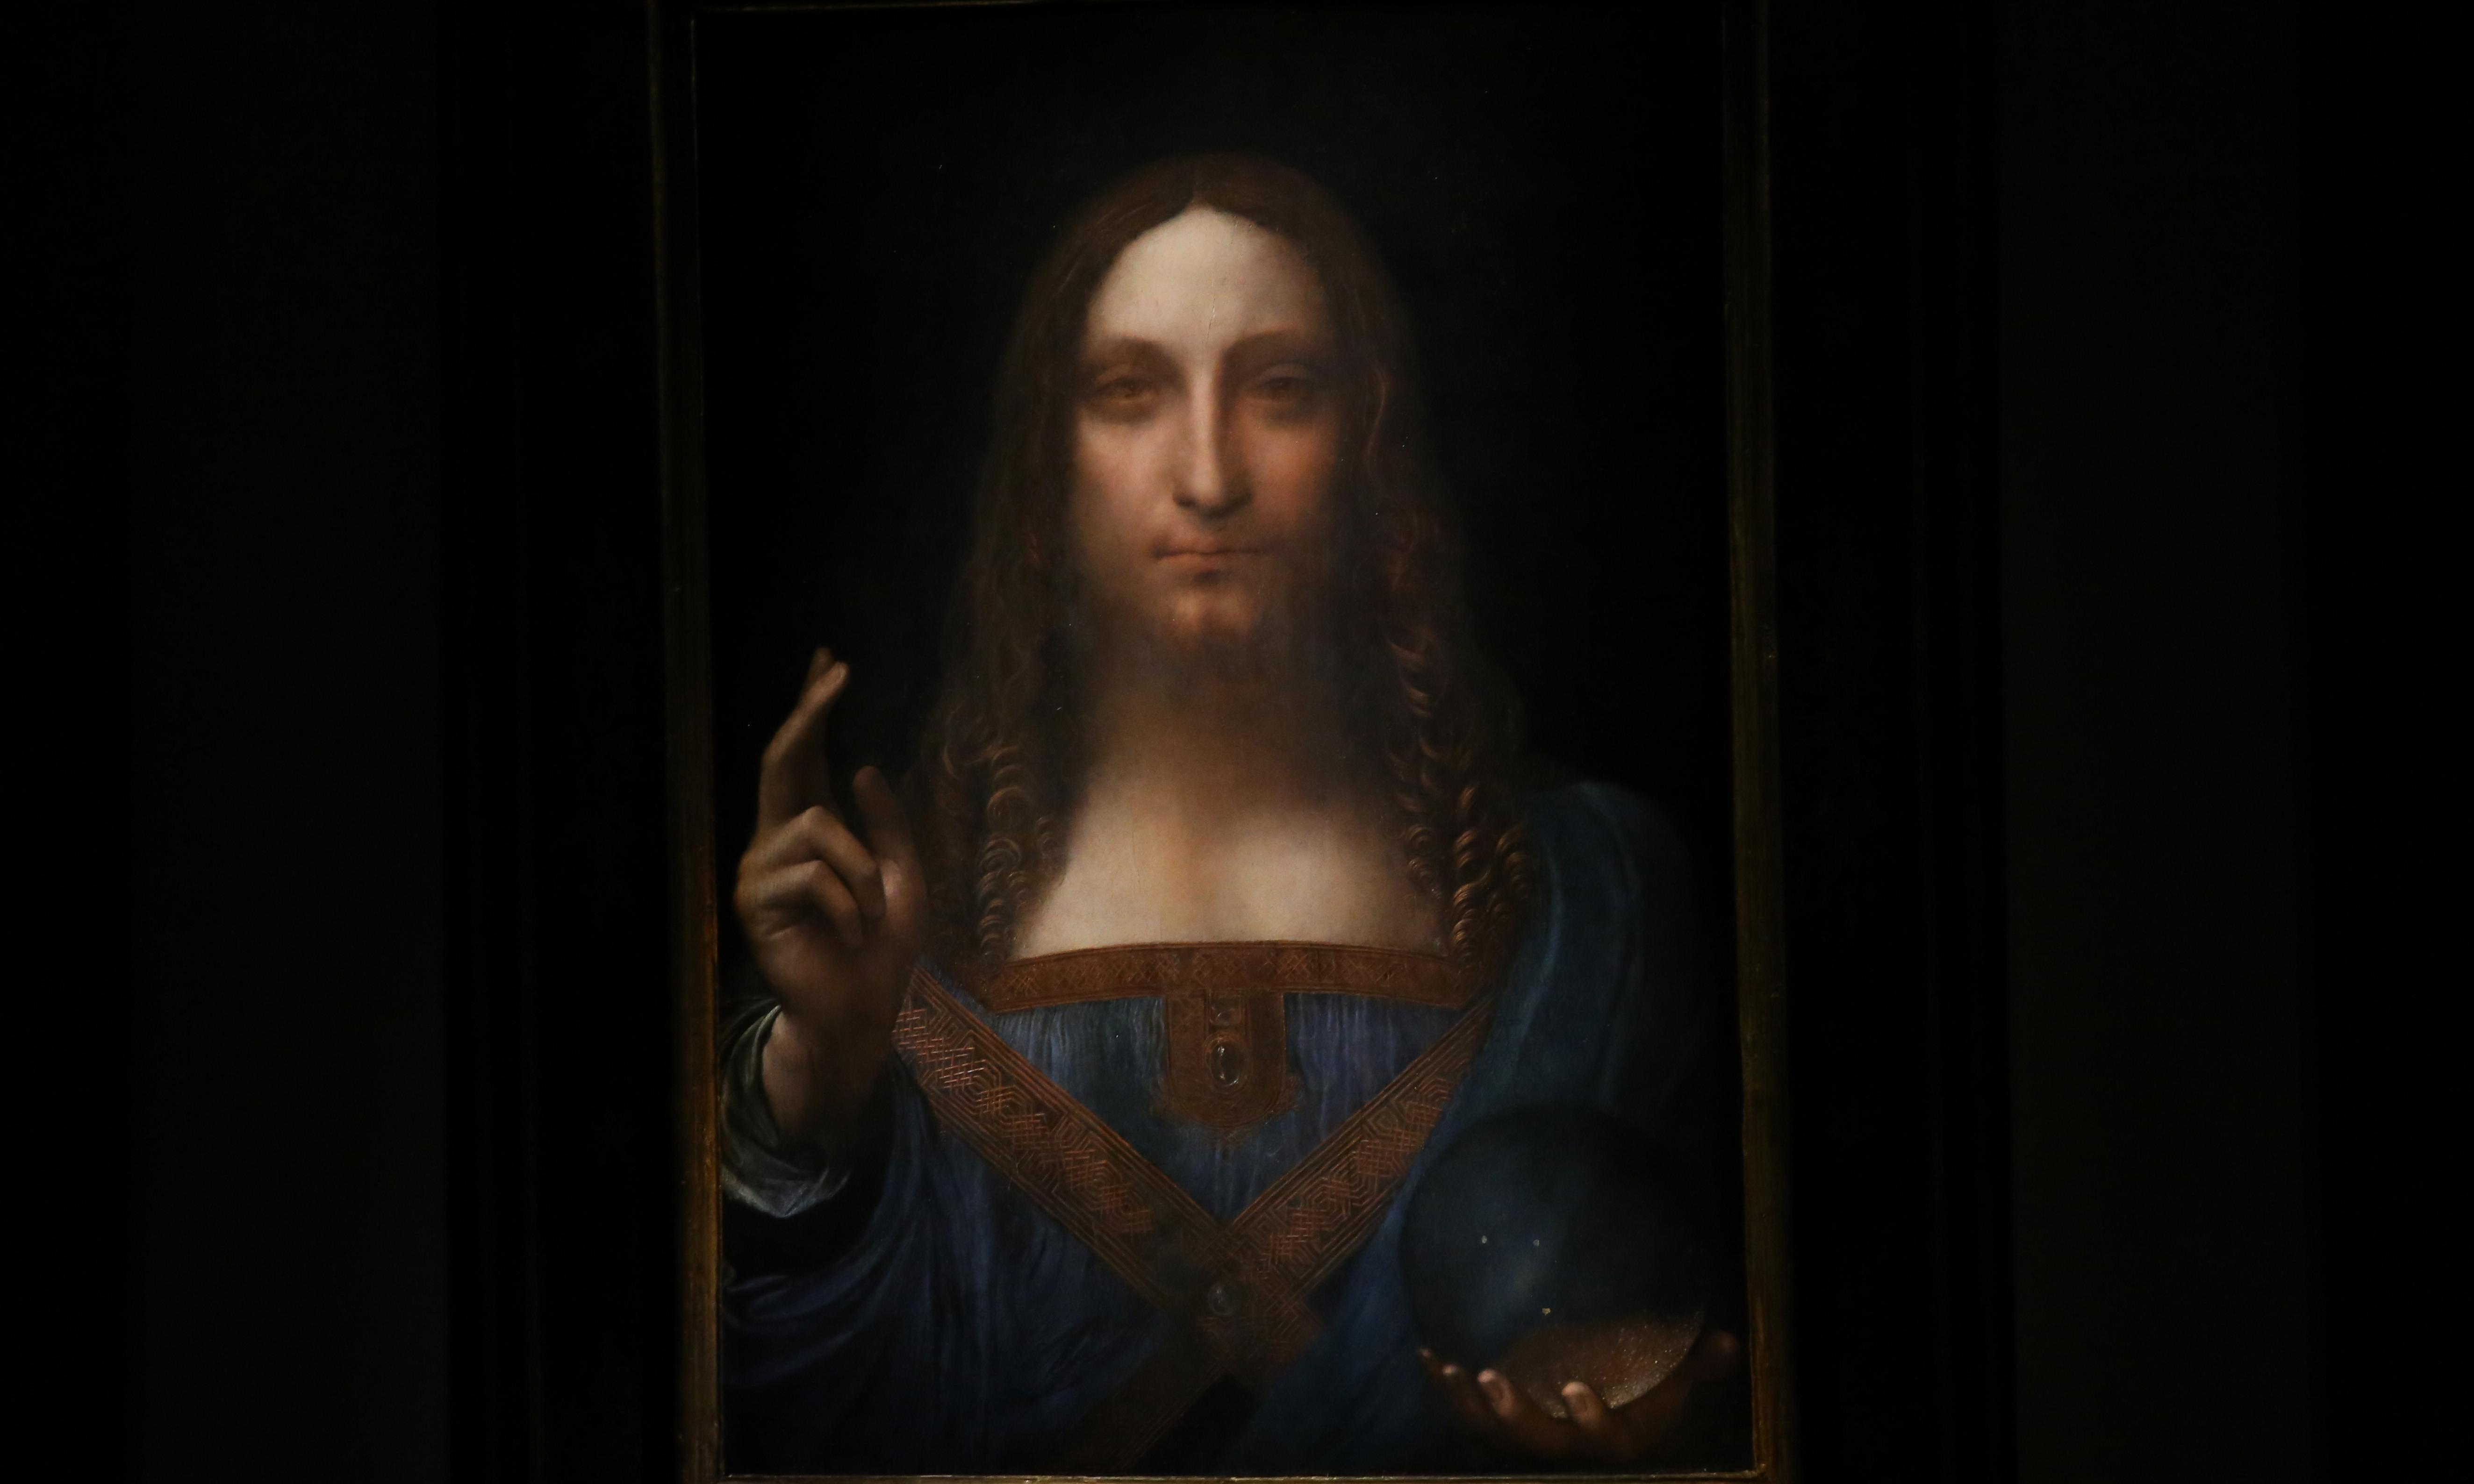 Leonardo scholar challenges attribution of $450m painting